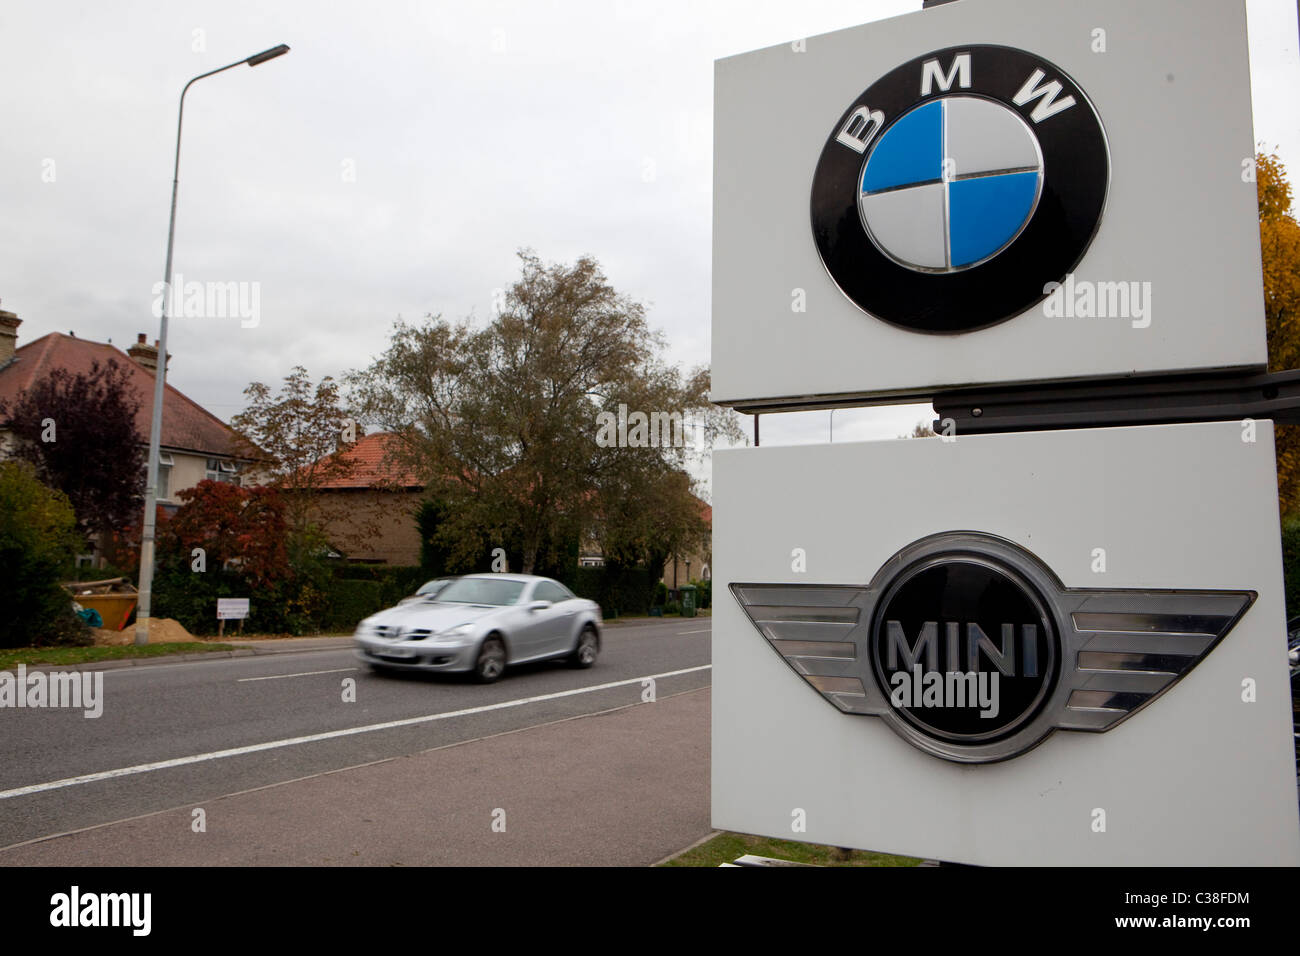 BMW MINI PARKING SIGN